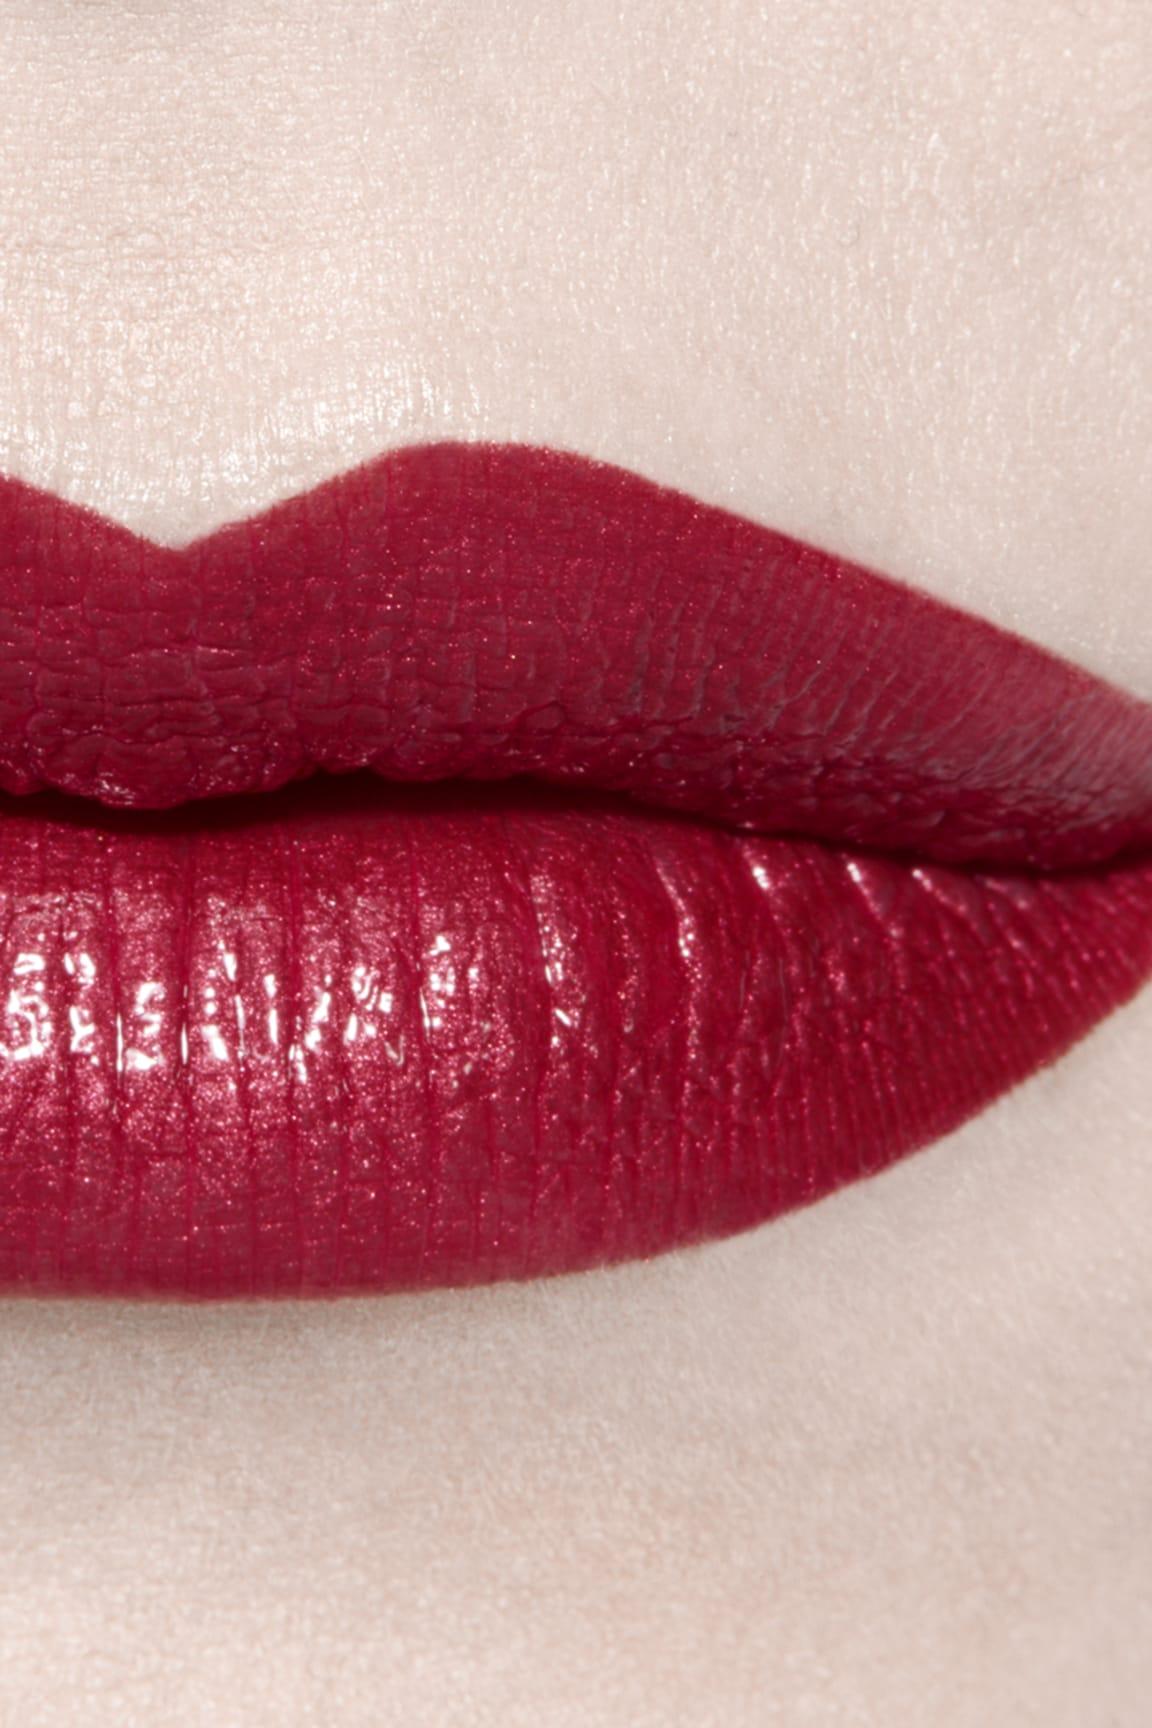 Anwendung Make-up-Bild 3 - ROUGE COCO BLOOM 142 - BURST